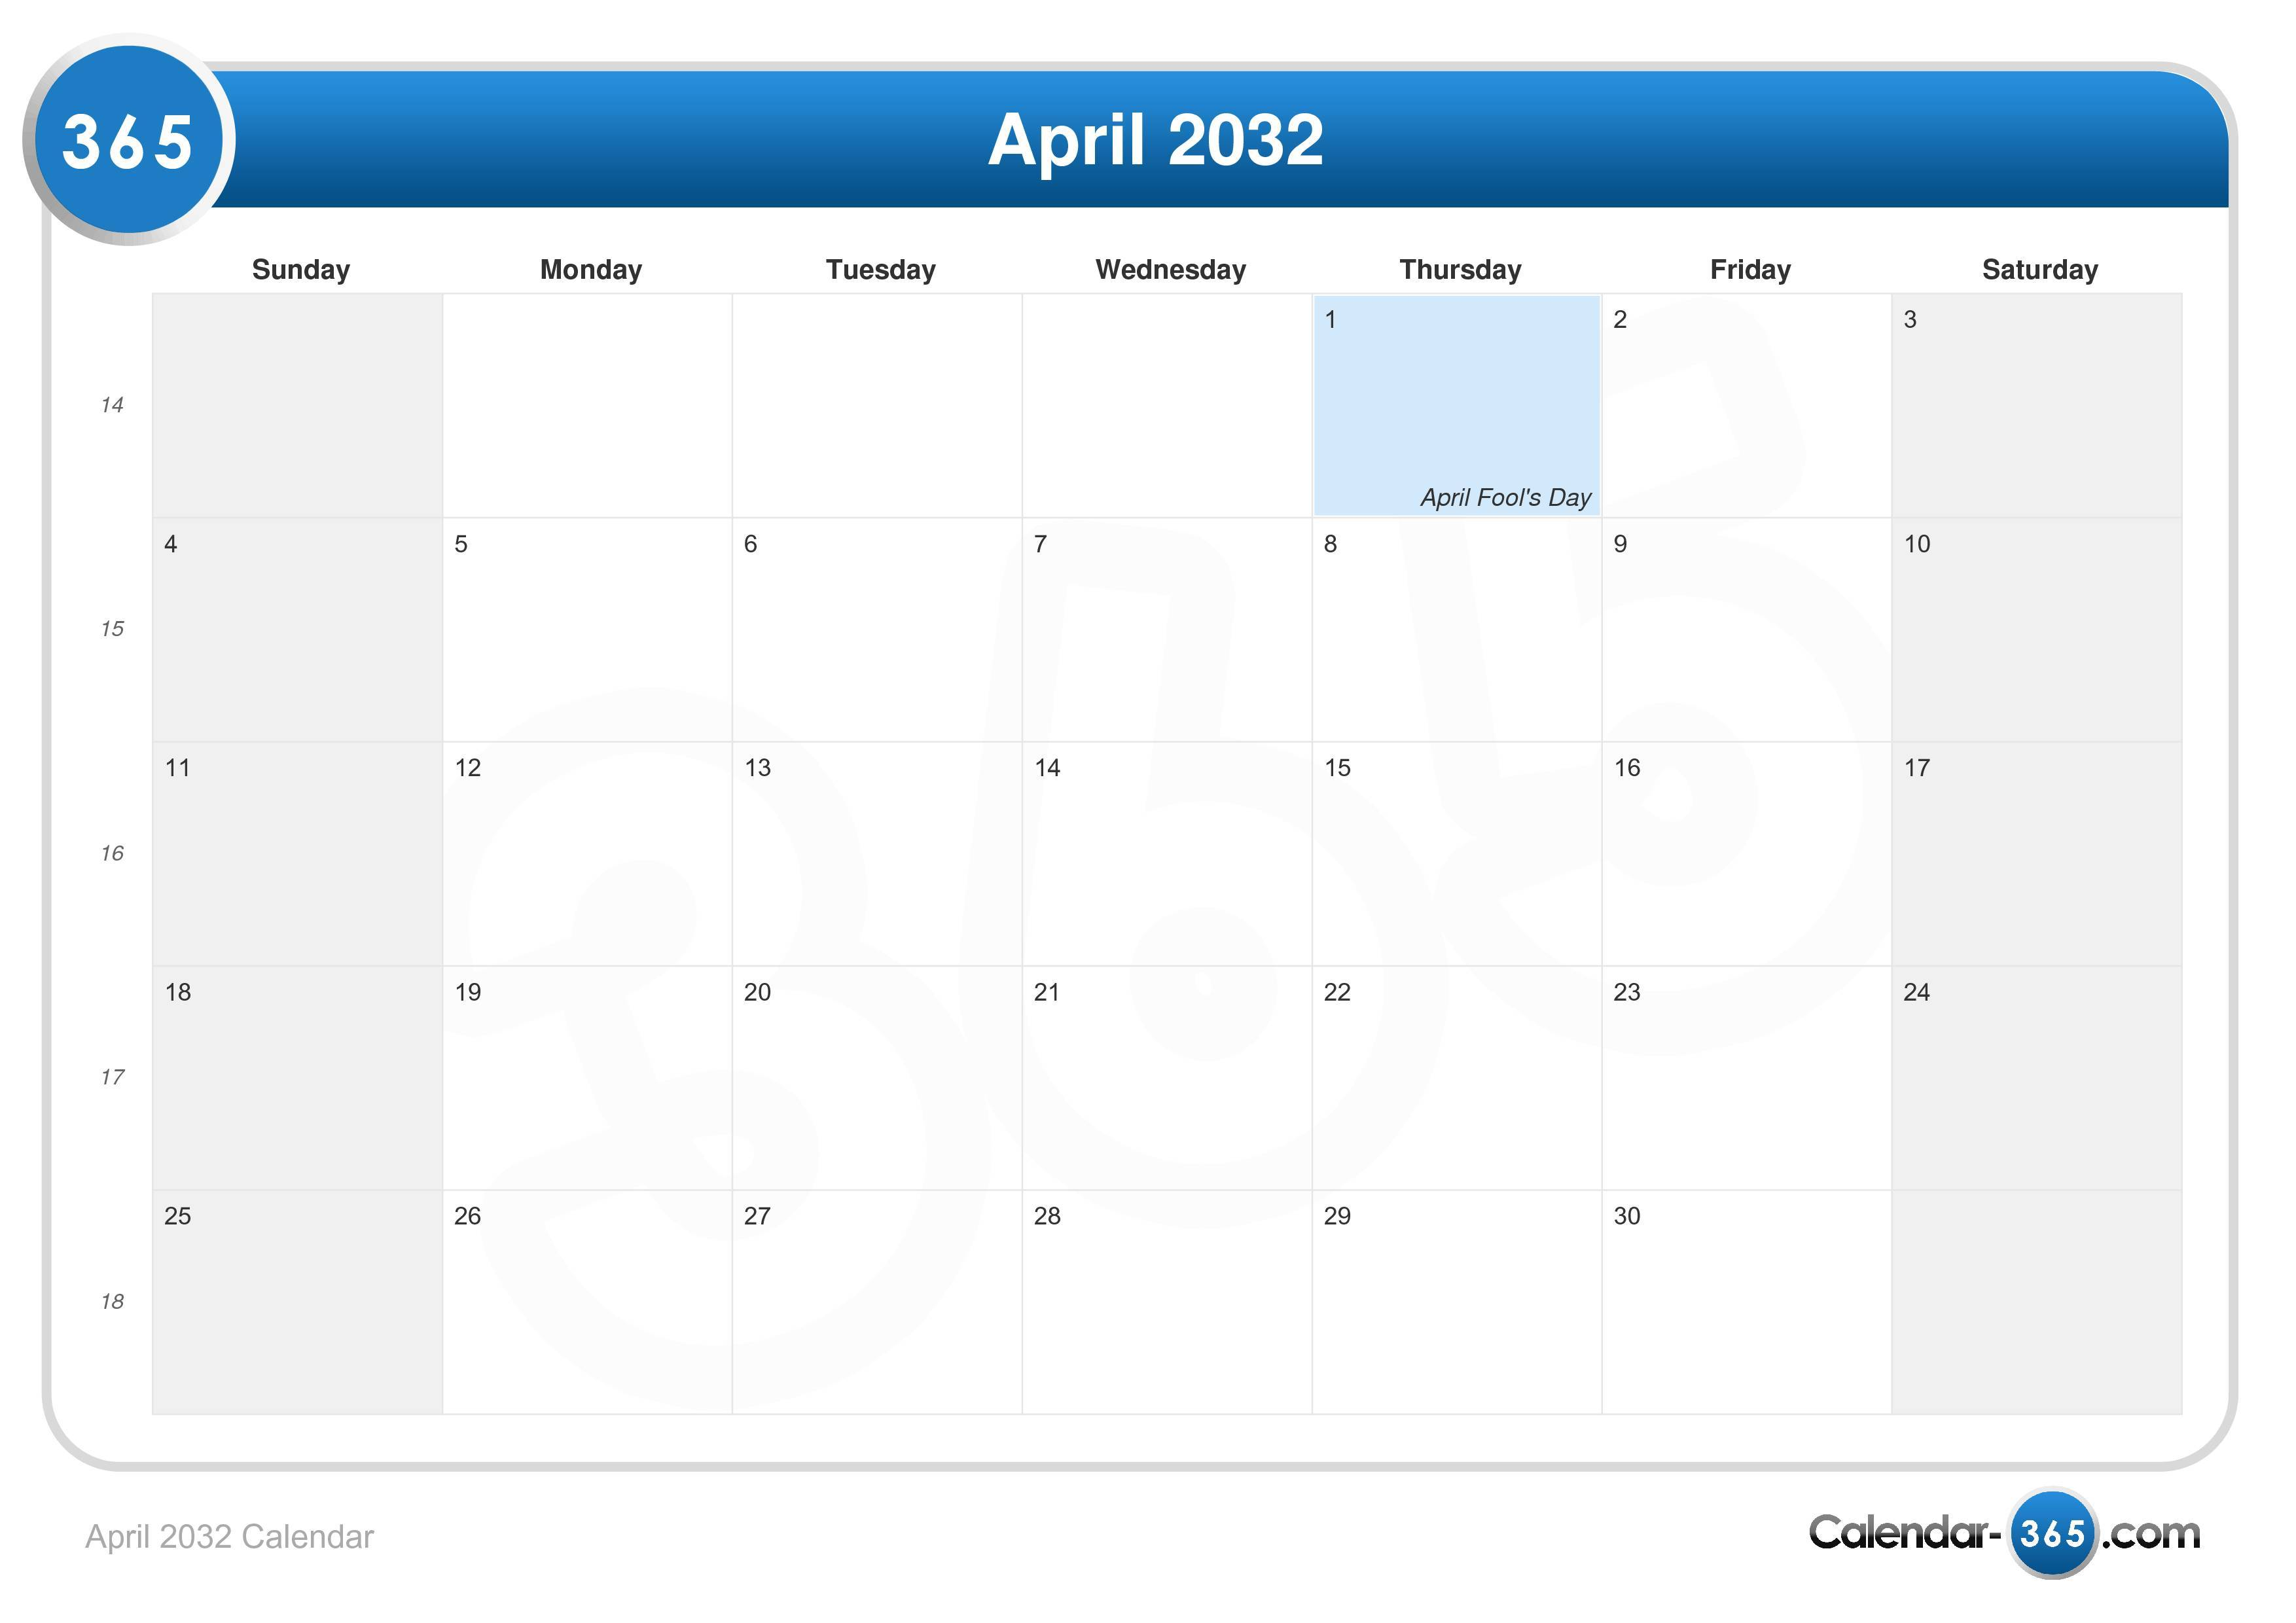 April 2032 Calendar